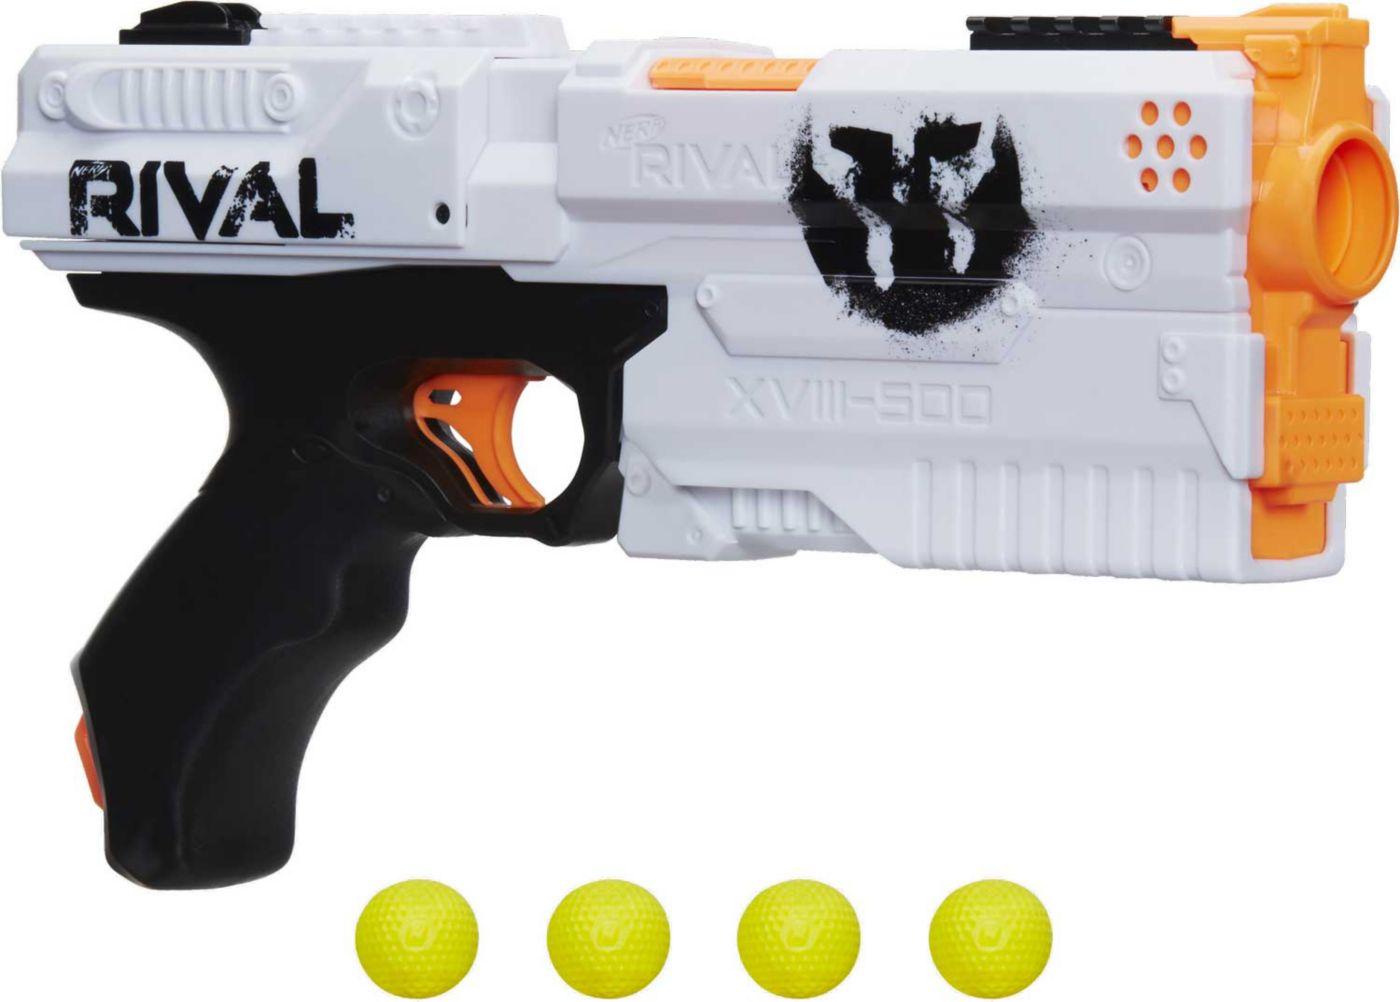 Nerf Rival Kronos $7.99 + Shipping